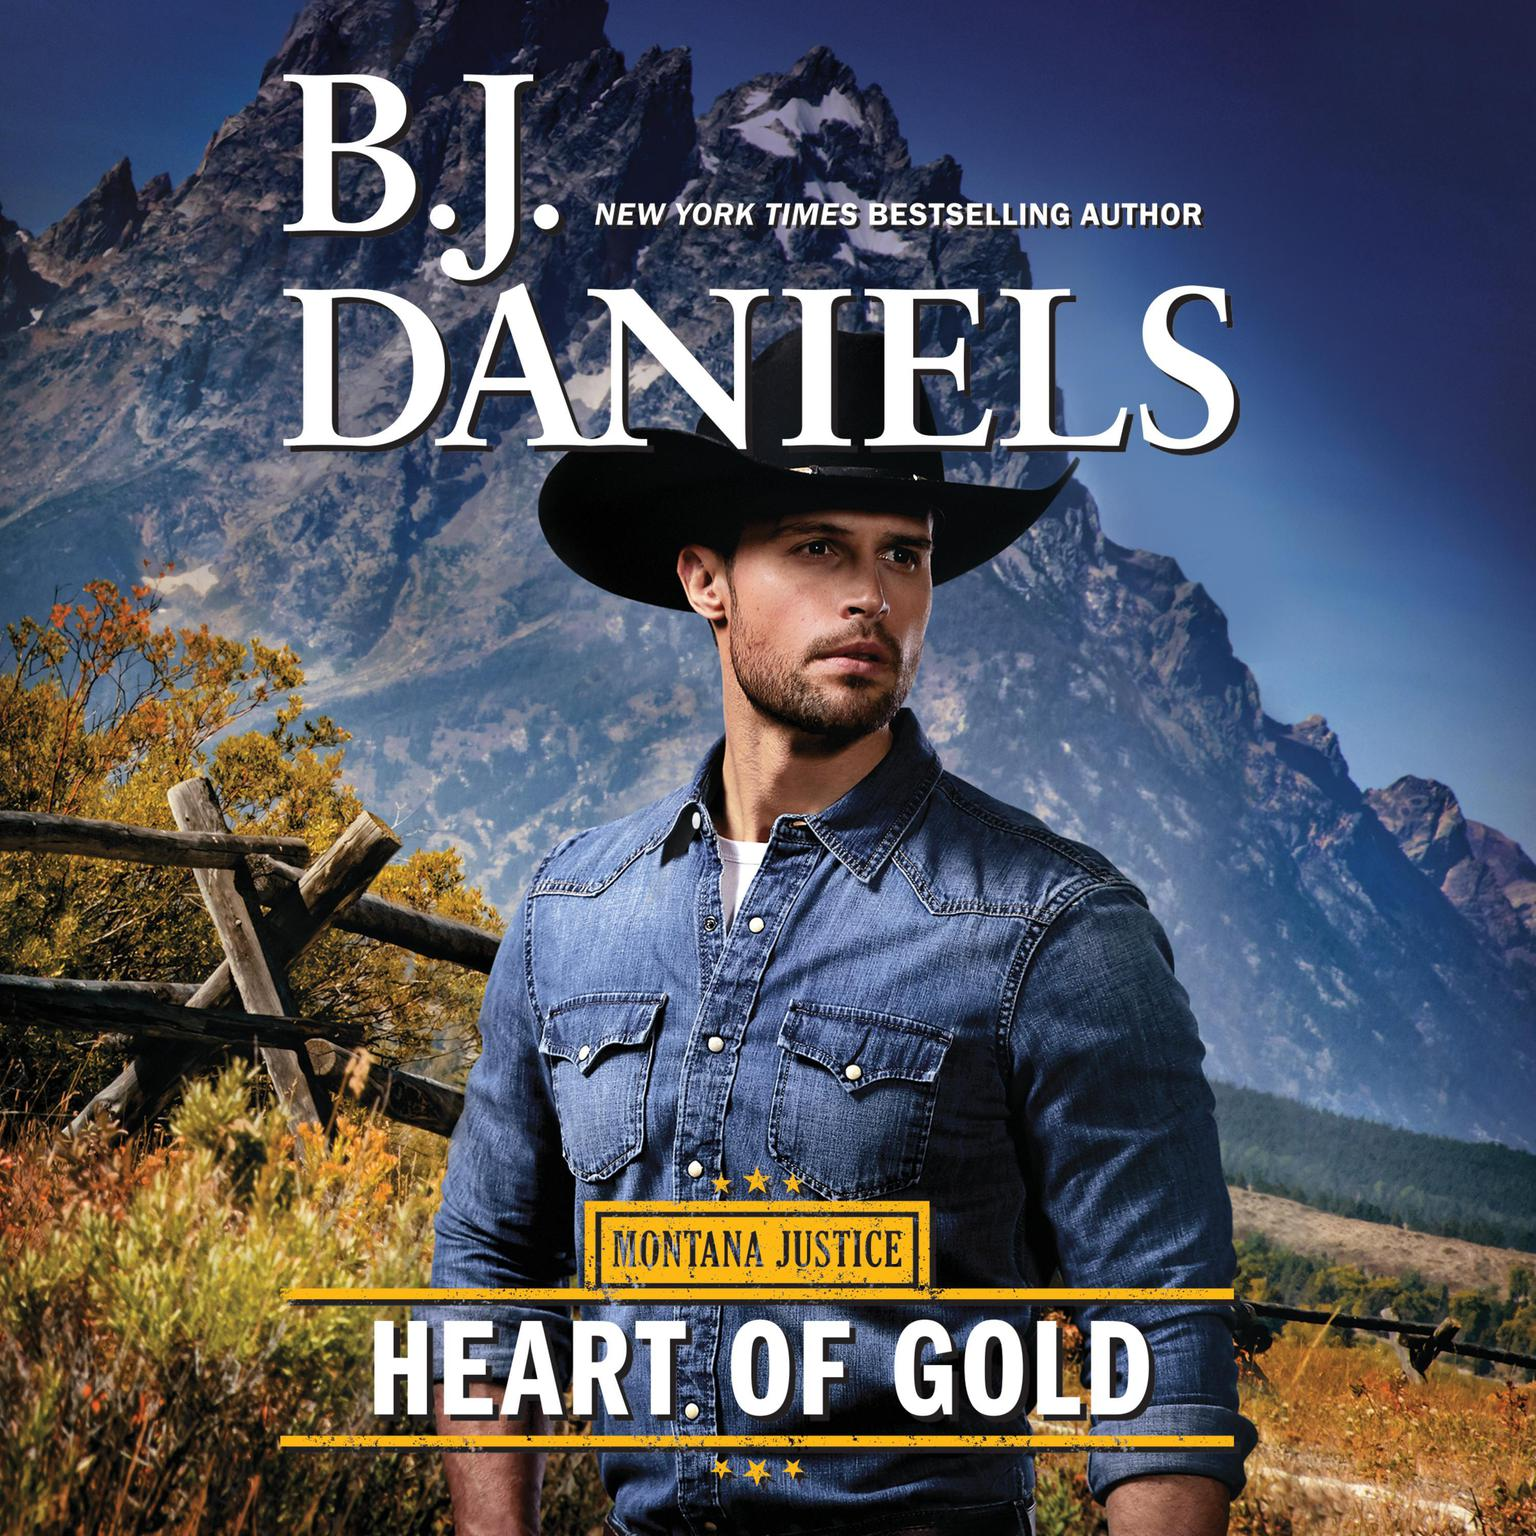 Heart of Gold: A Novel Audiobook, by B. J. Daniels